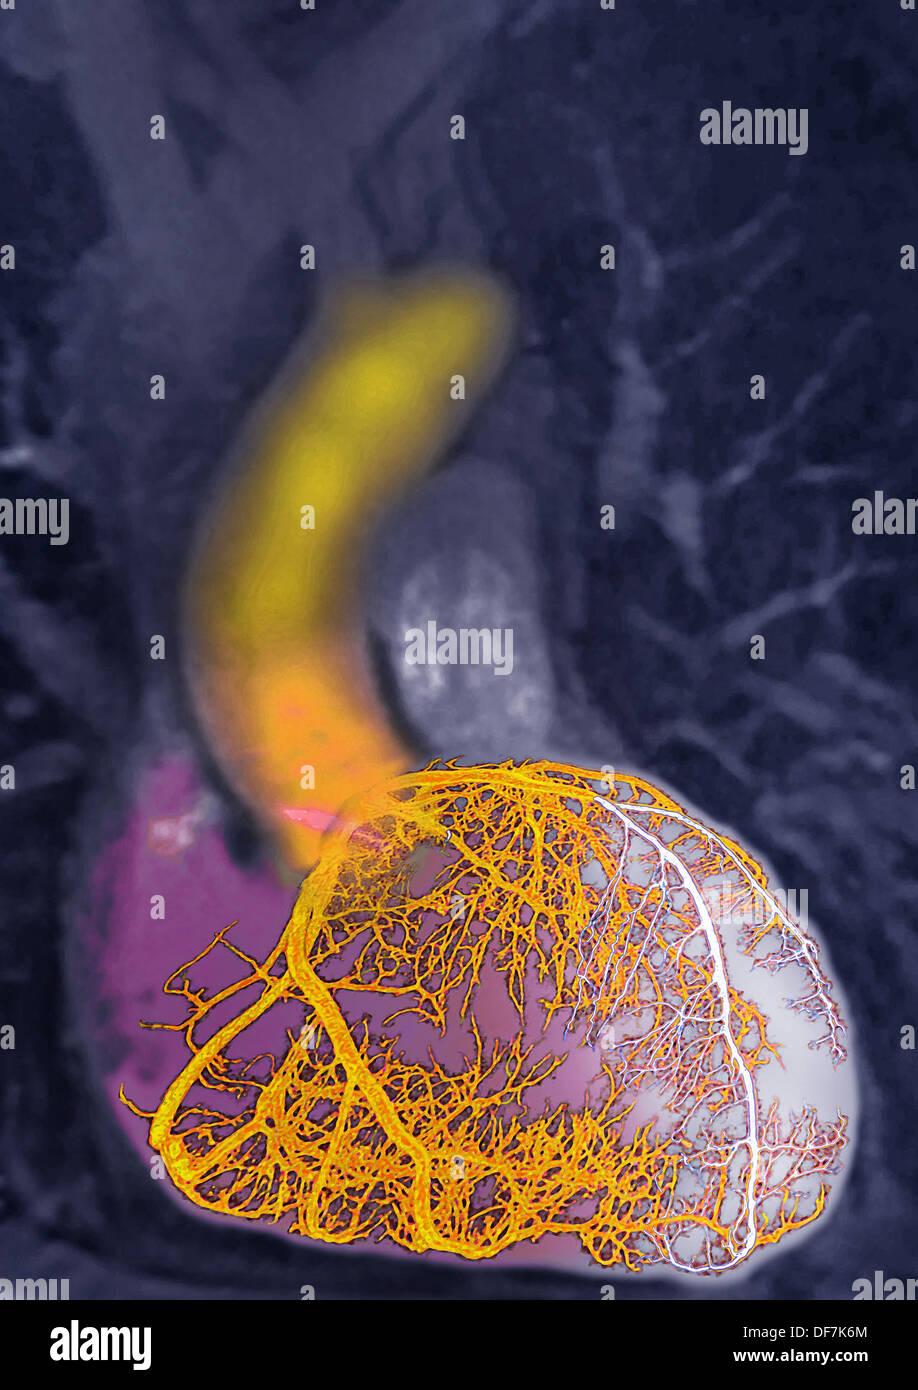 Myocardial Infarction Stockfotos & Myocardial Infarction Bilder - Alamy